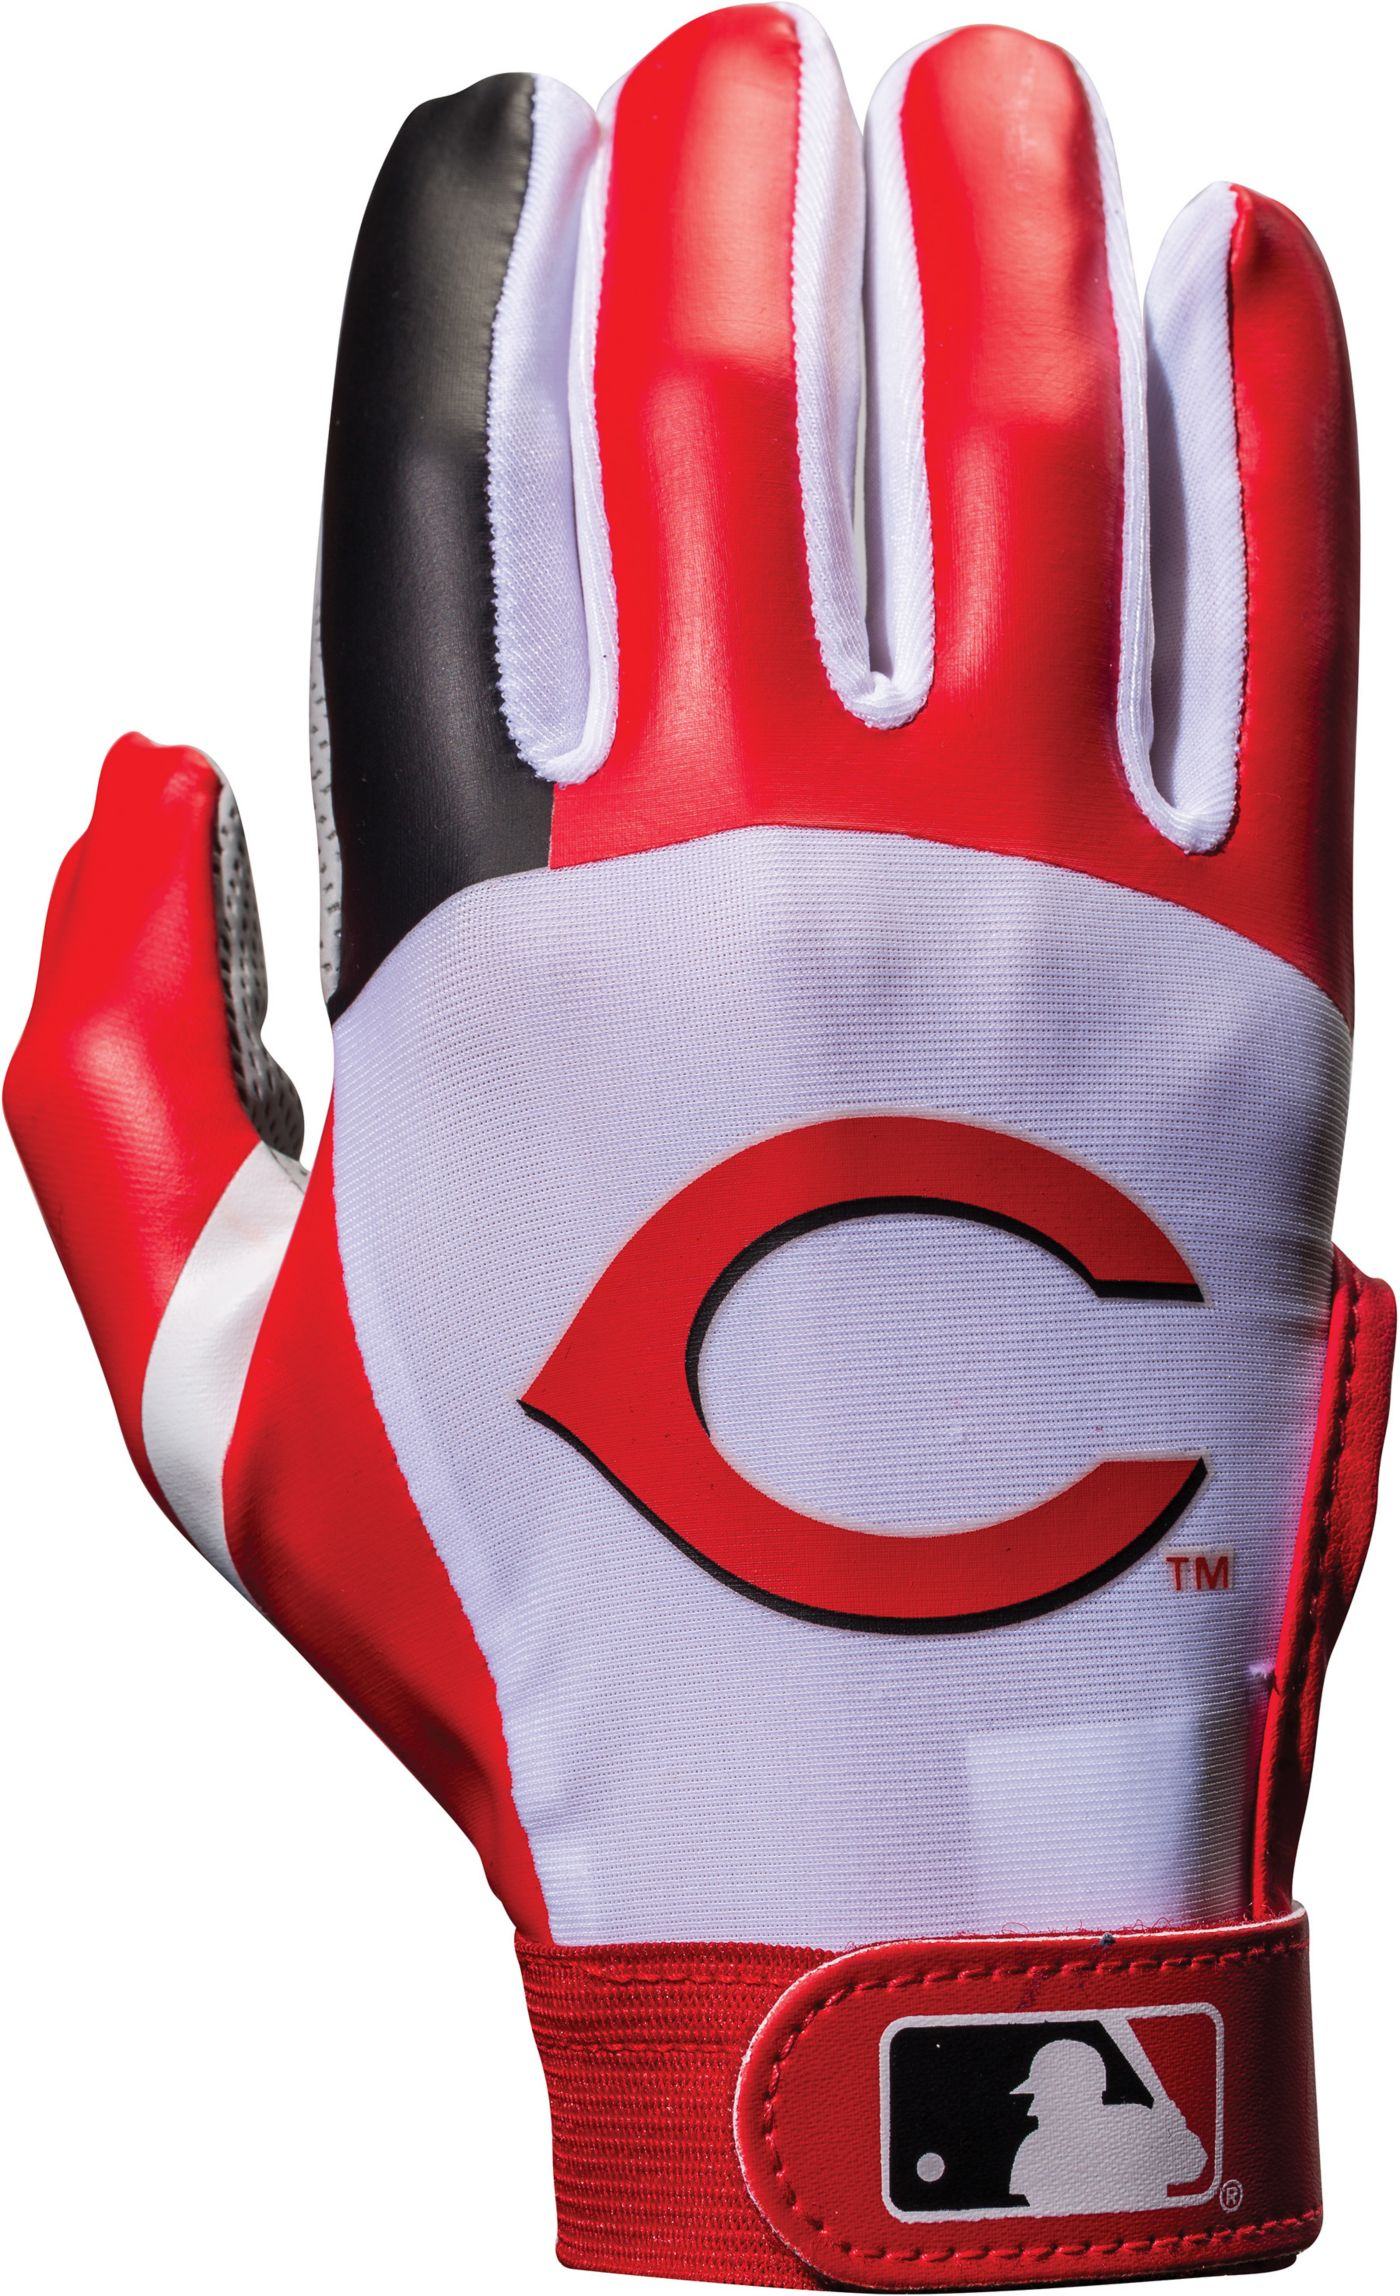 Franklin Cincinnati Reds Youth Batting Gloves